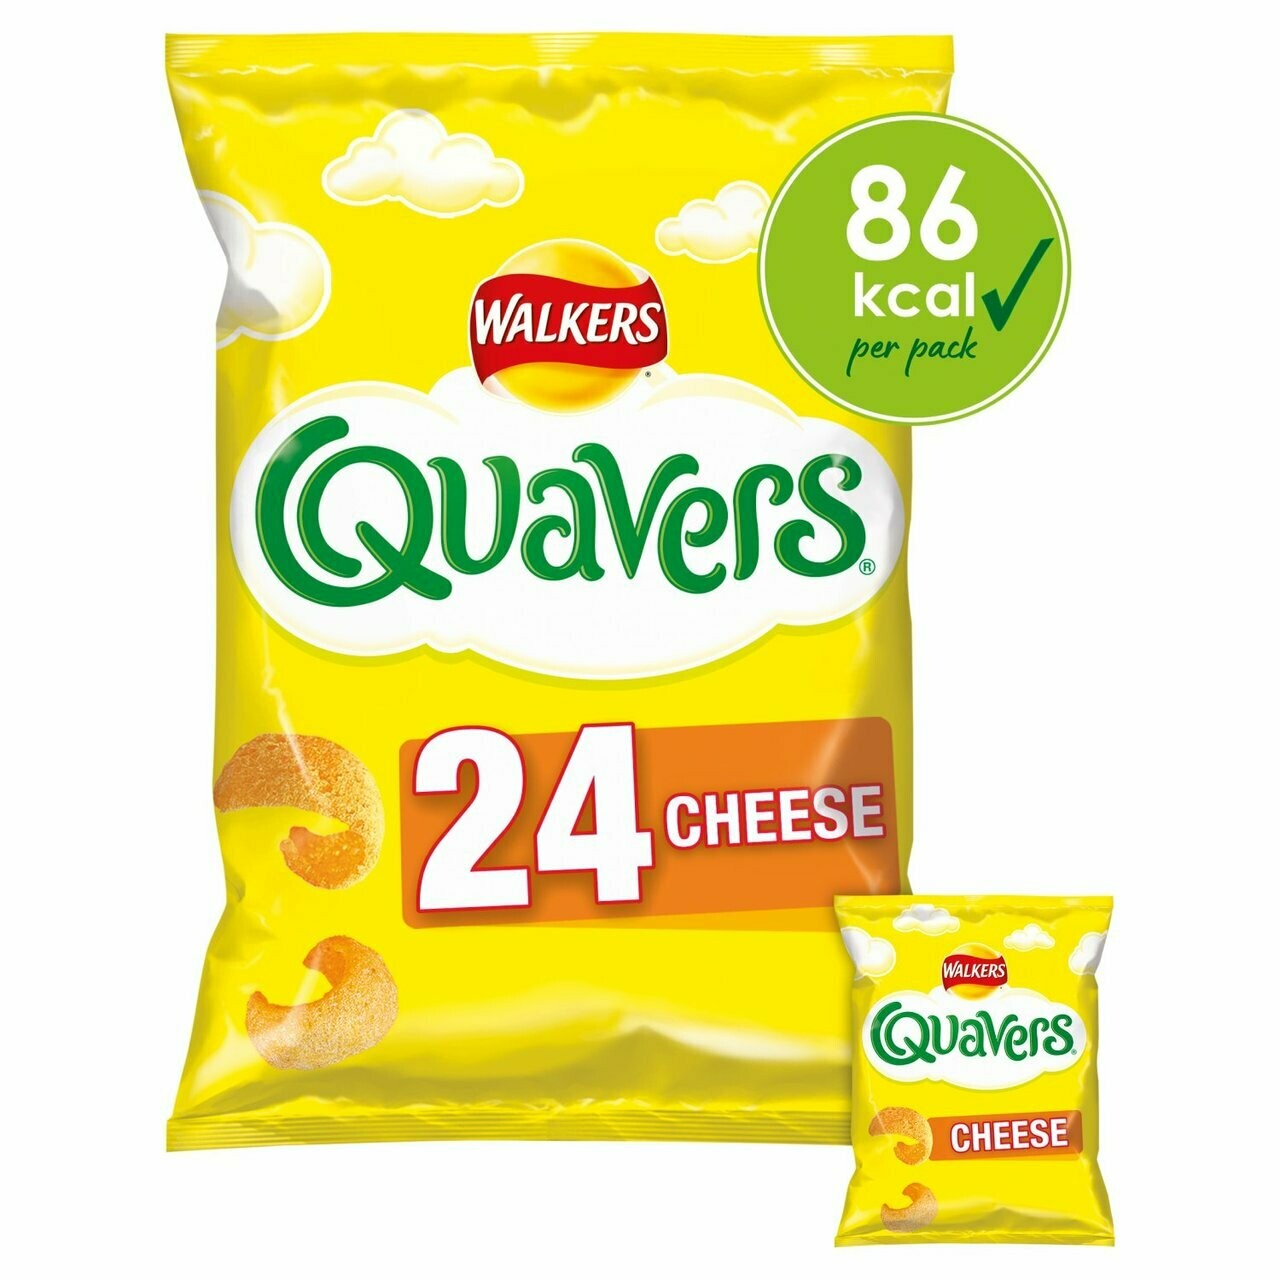 Walkers Quavers Cheese Snacks Multipack 16g Bag [24 PACK]